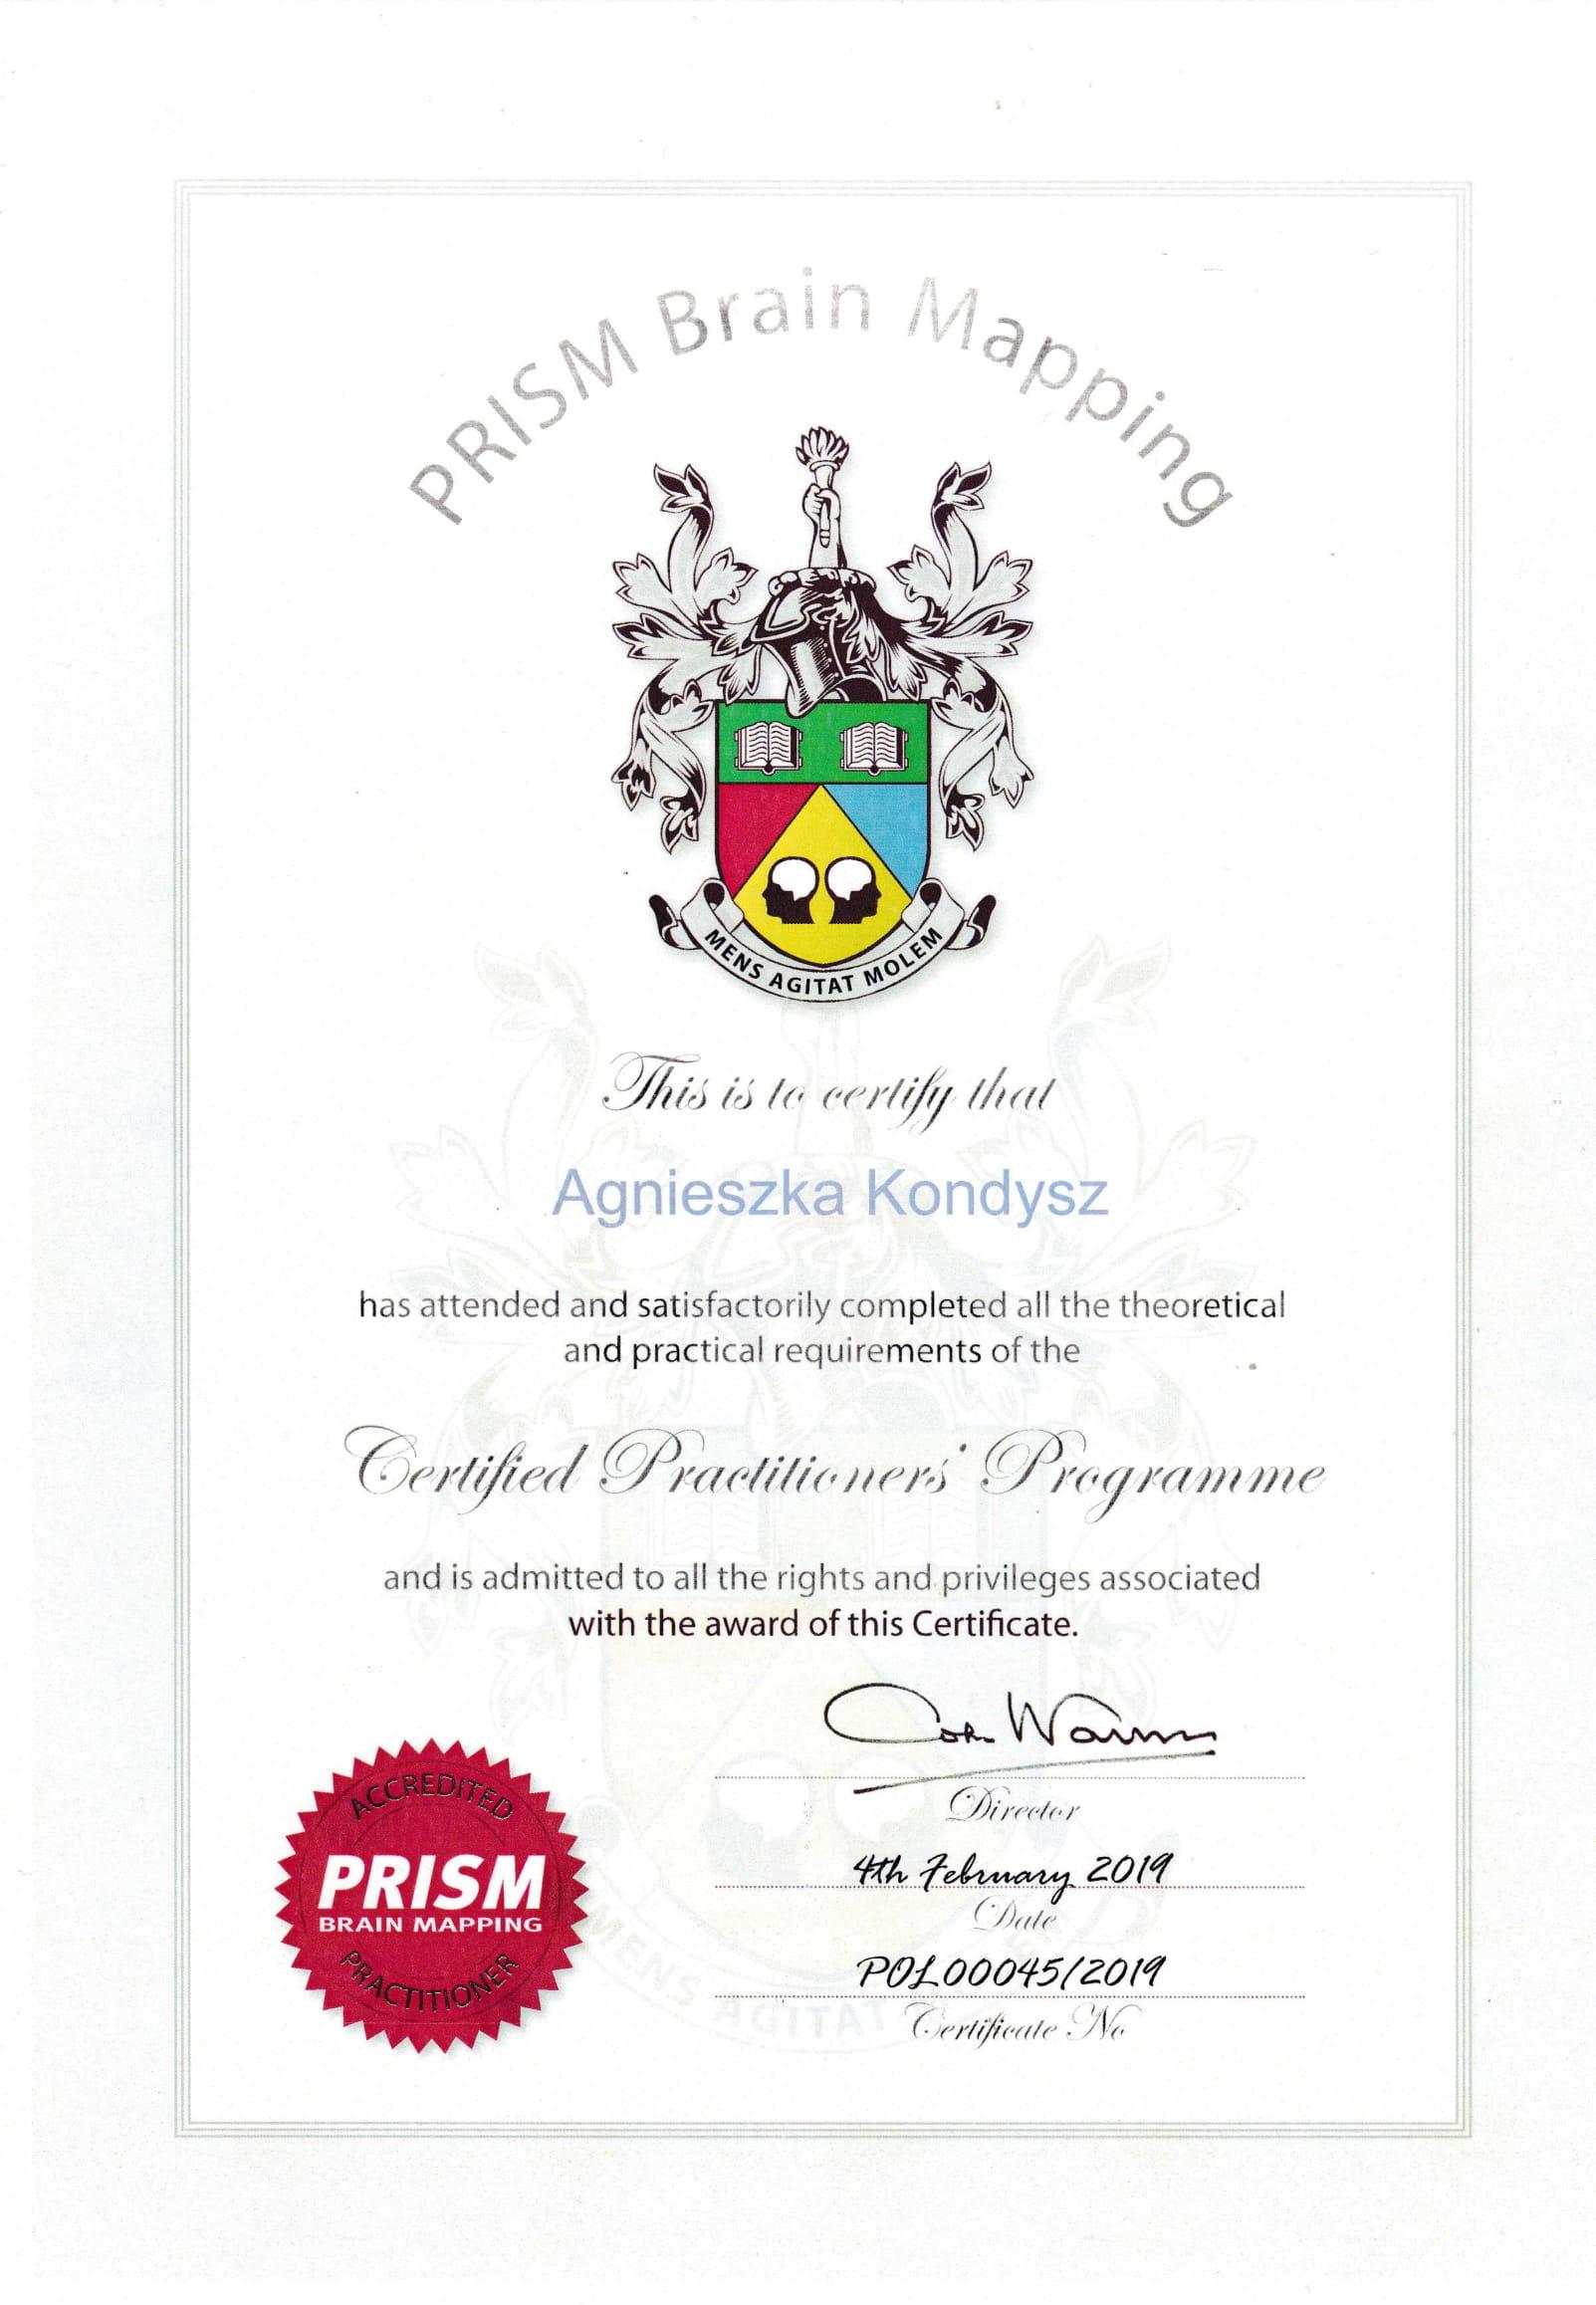 2_PRISM-1-min